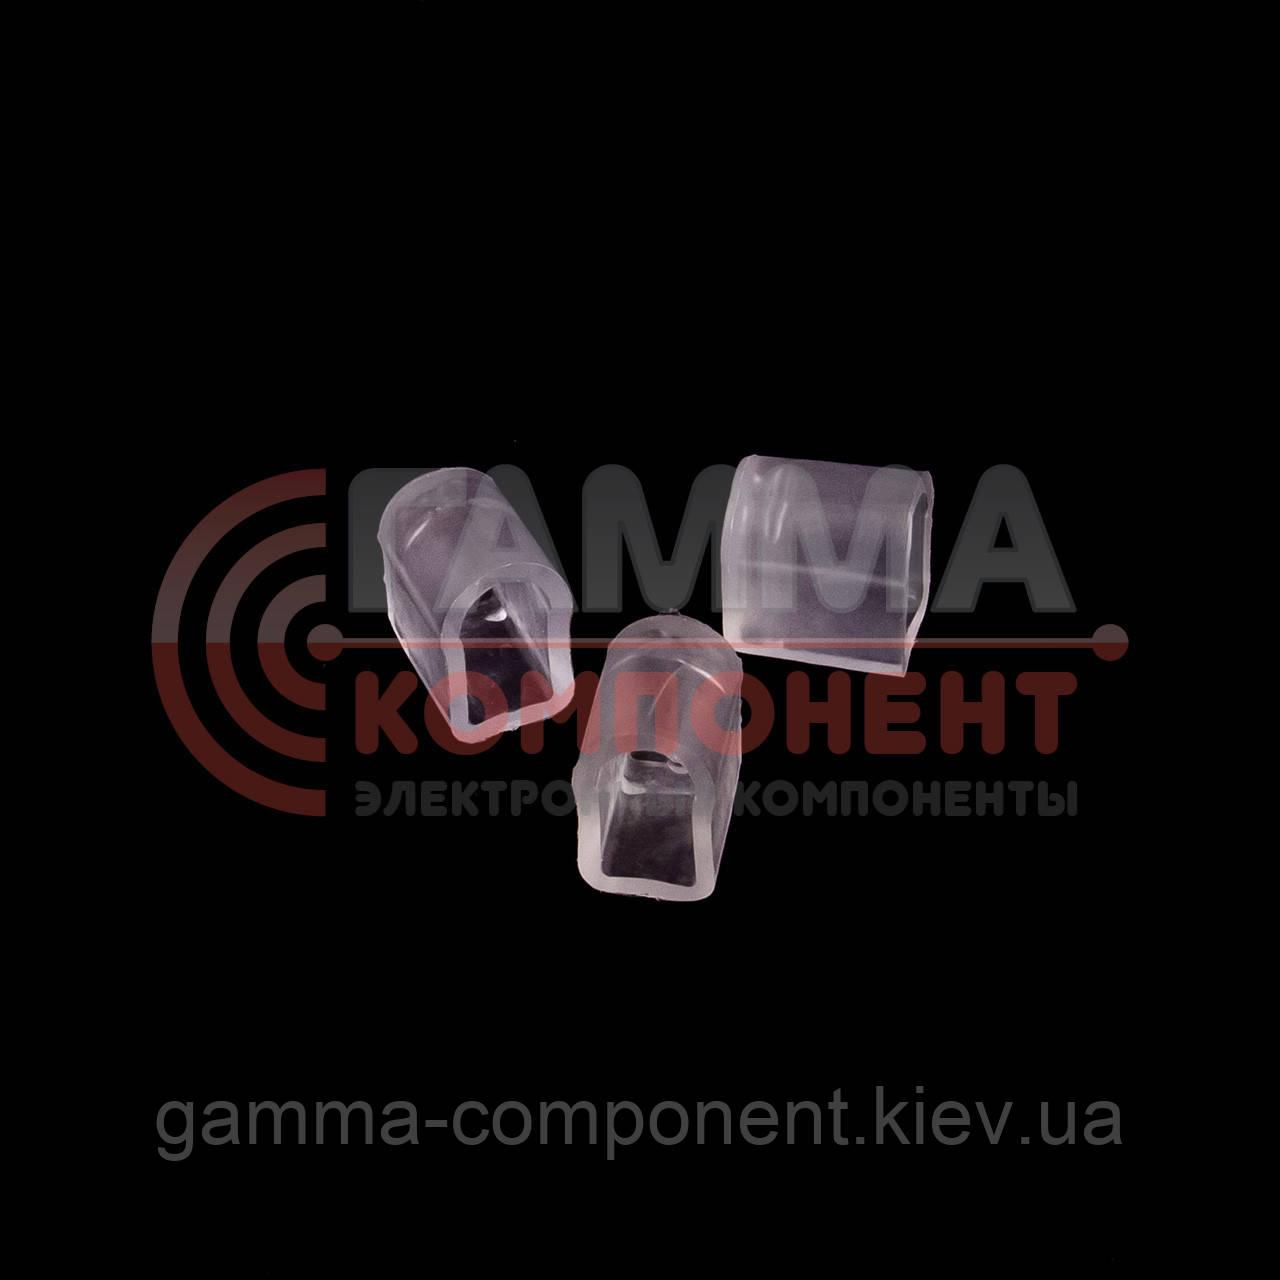 Заглушка для светодиодной ленты 220B AVT smd 2835-120 лед/м